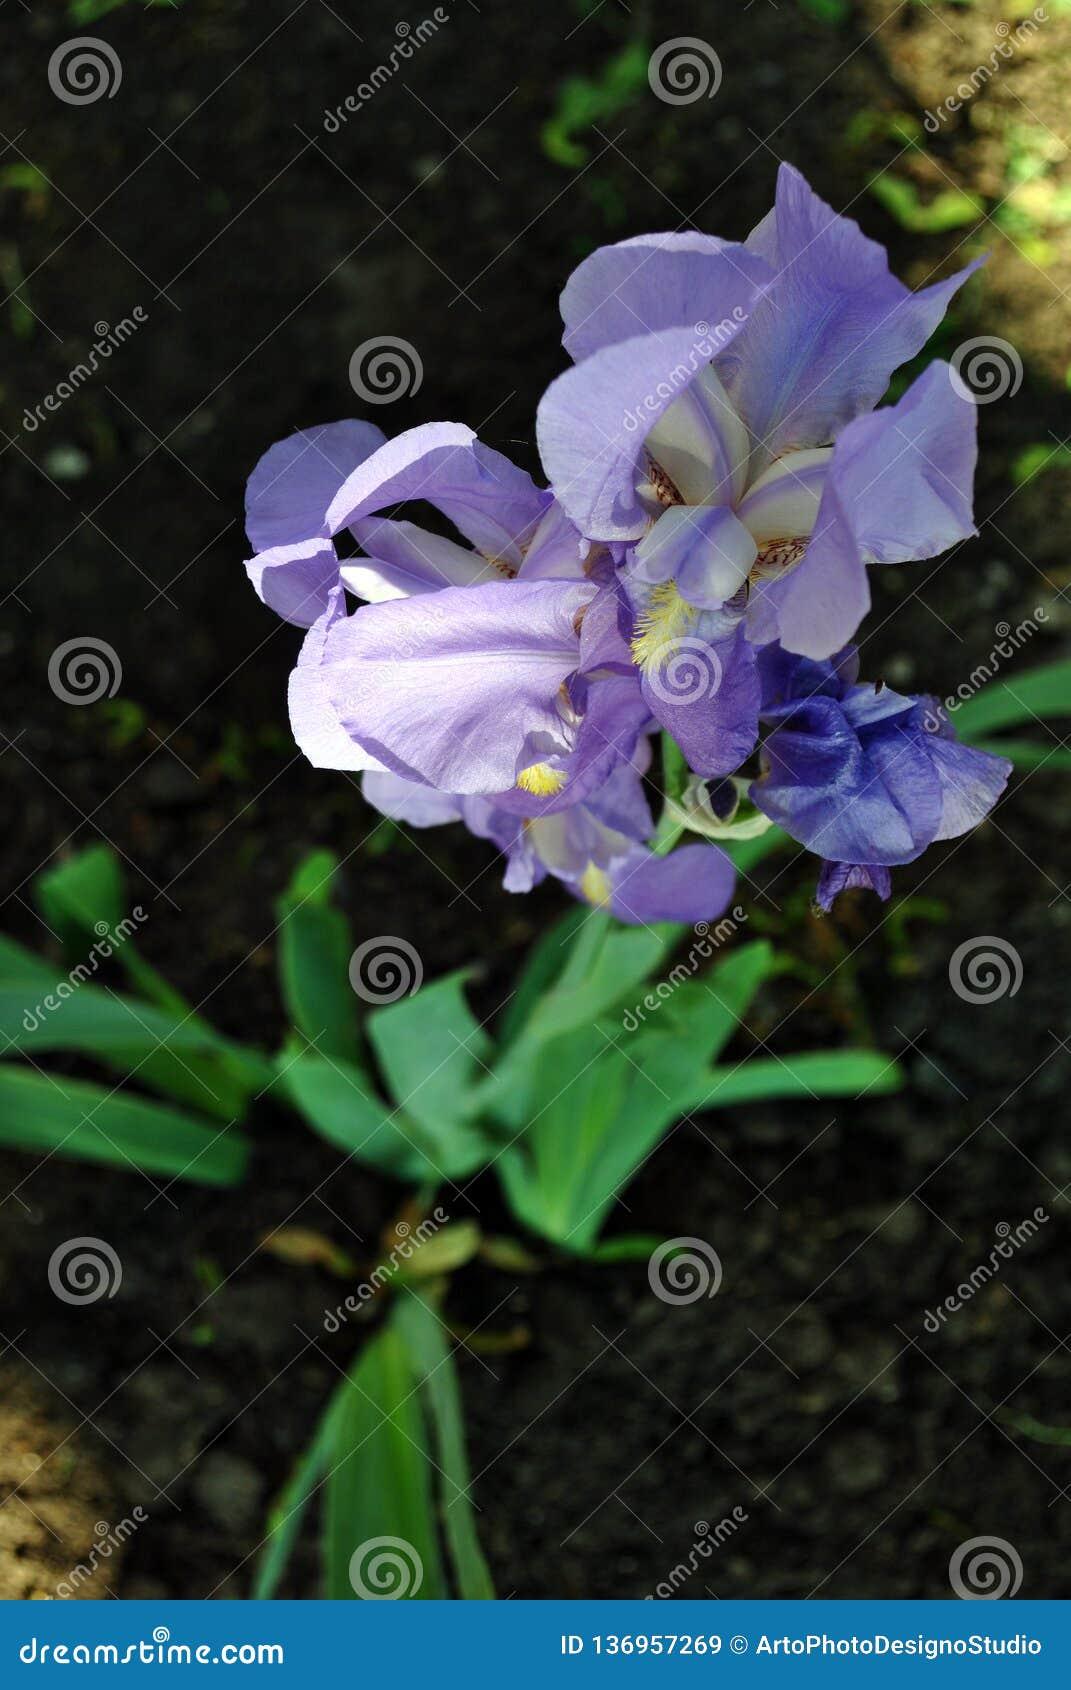 Blue iris flower blooming, blurry green leaves and dark soil